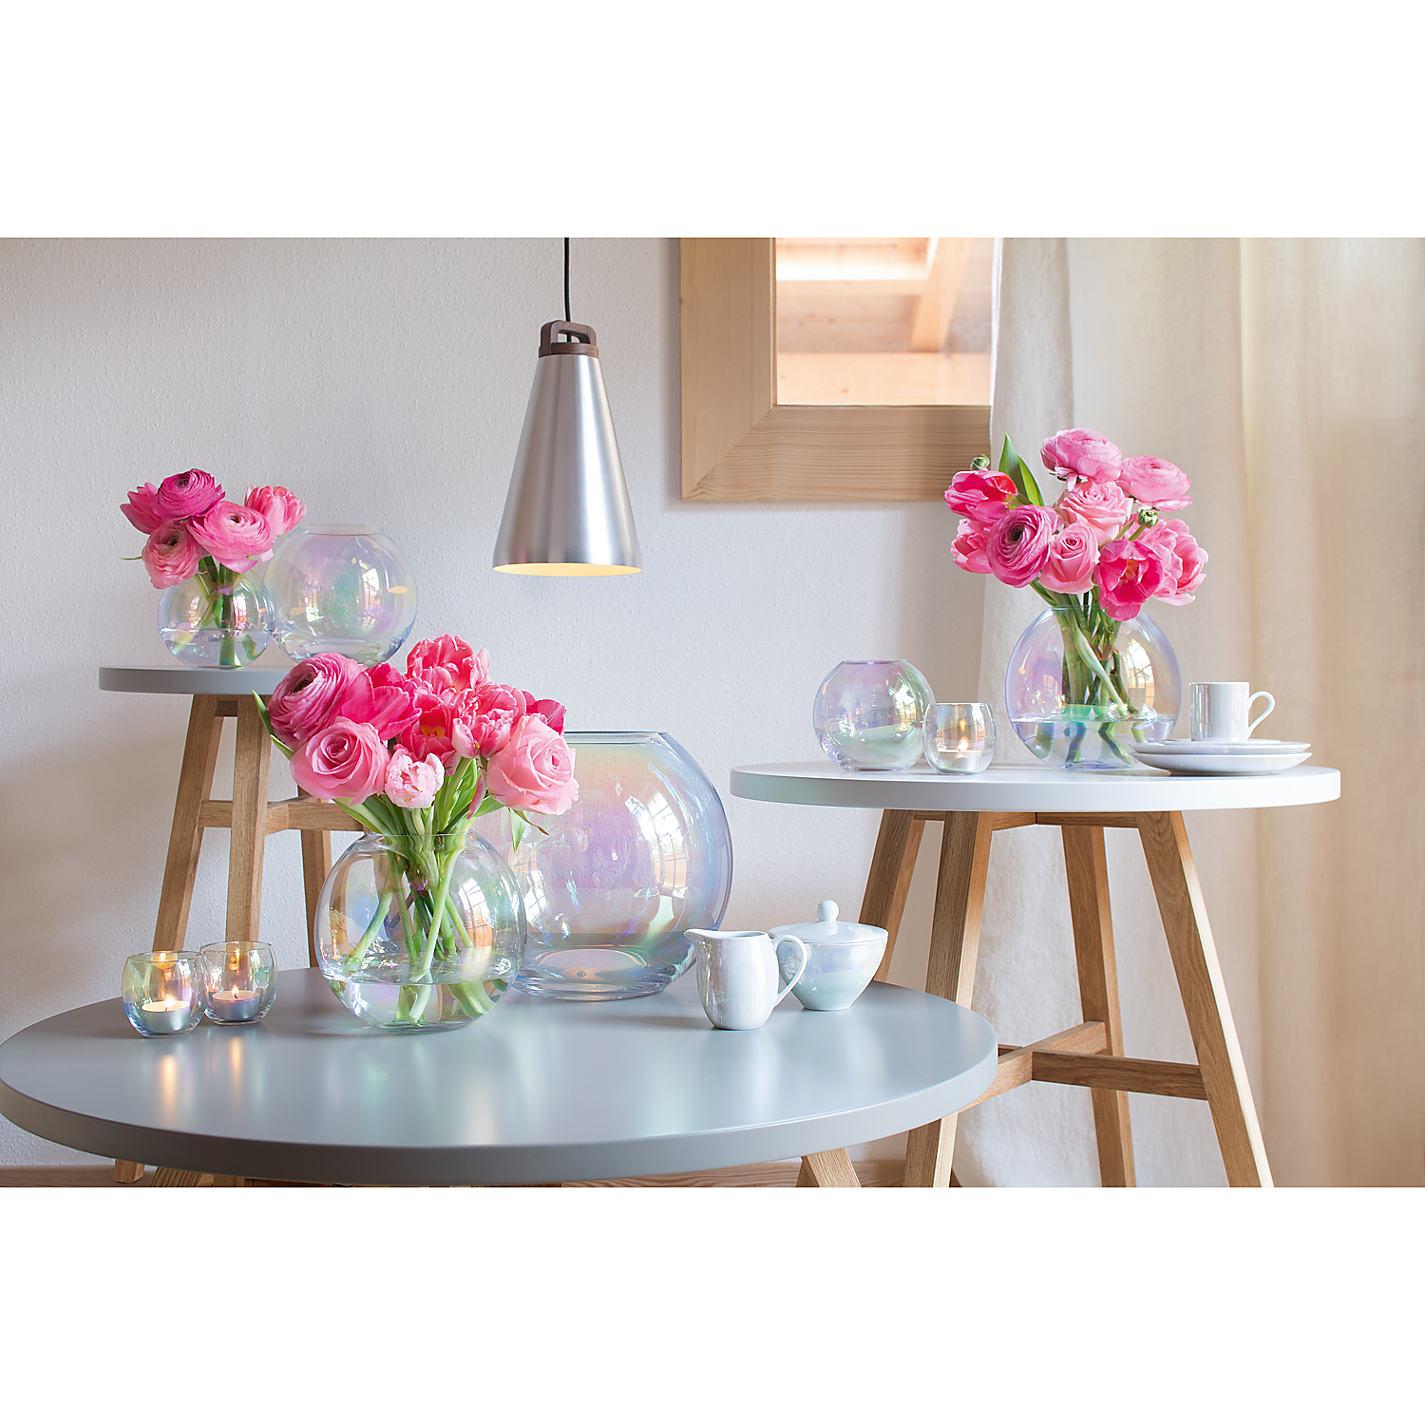 Buy lsa international pearl vase h16cm john lewis buy lsa international pearl vase h16cm online at johnlewis reviewsmspy